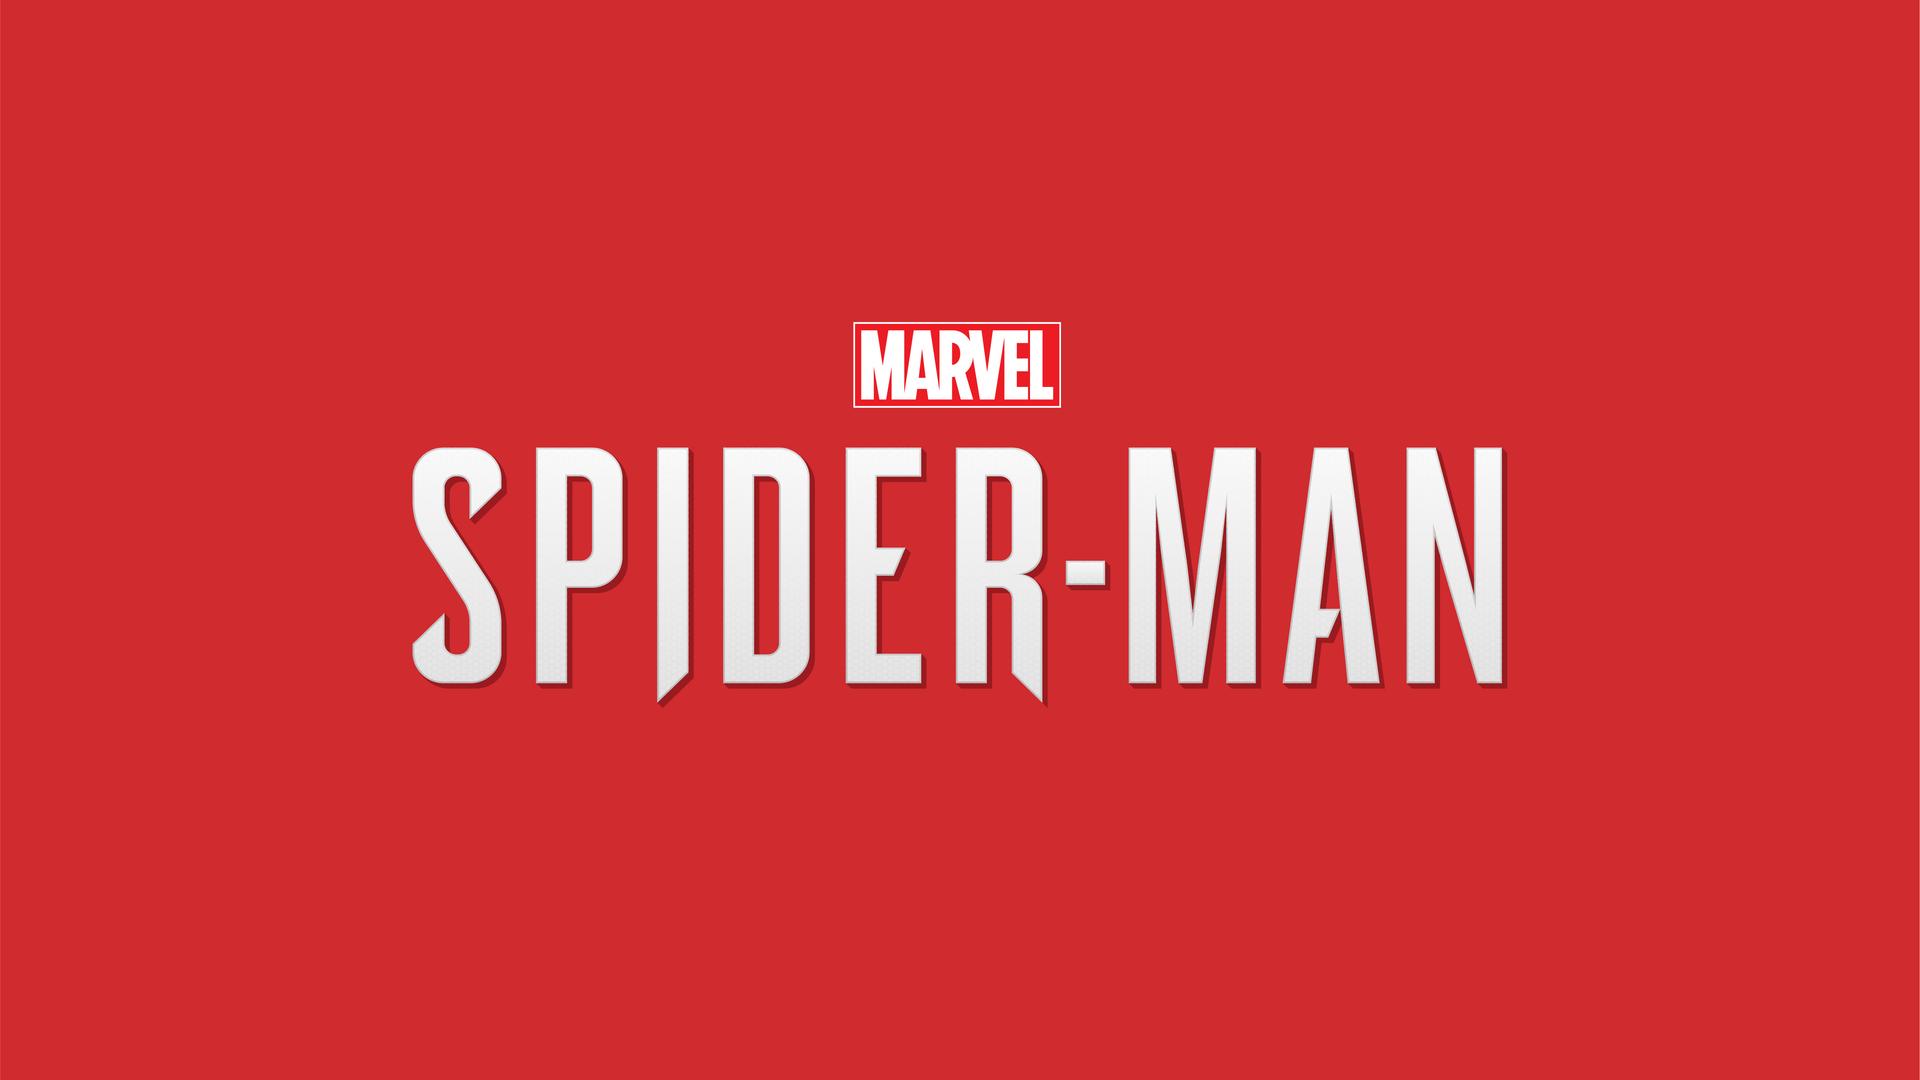 1920x1080 Marvel Spiderman Ps4 Logo 5k Laptop Full Hd 1080p Hd 4k